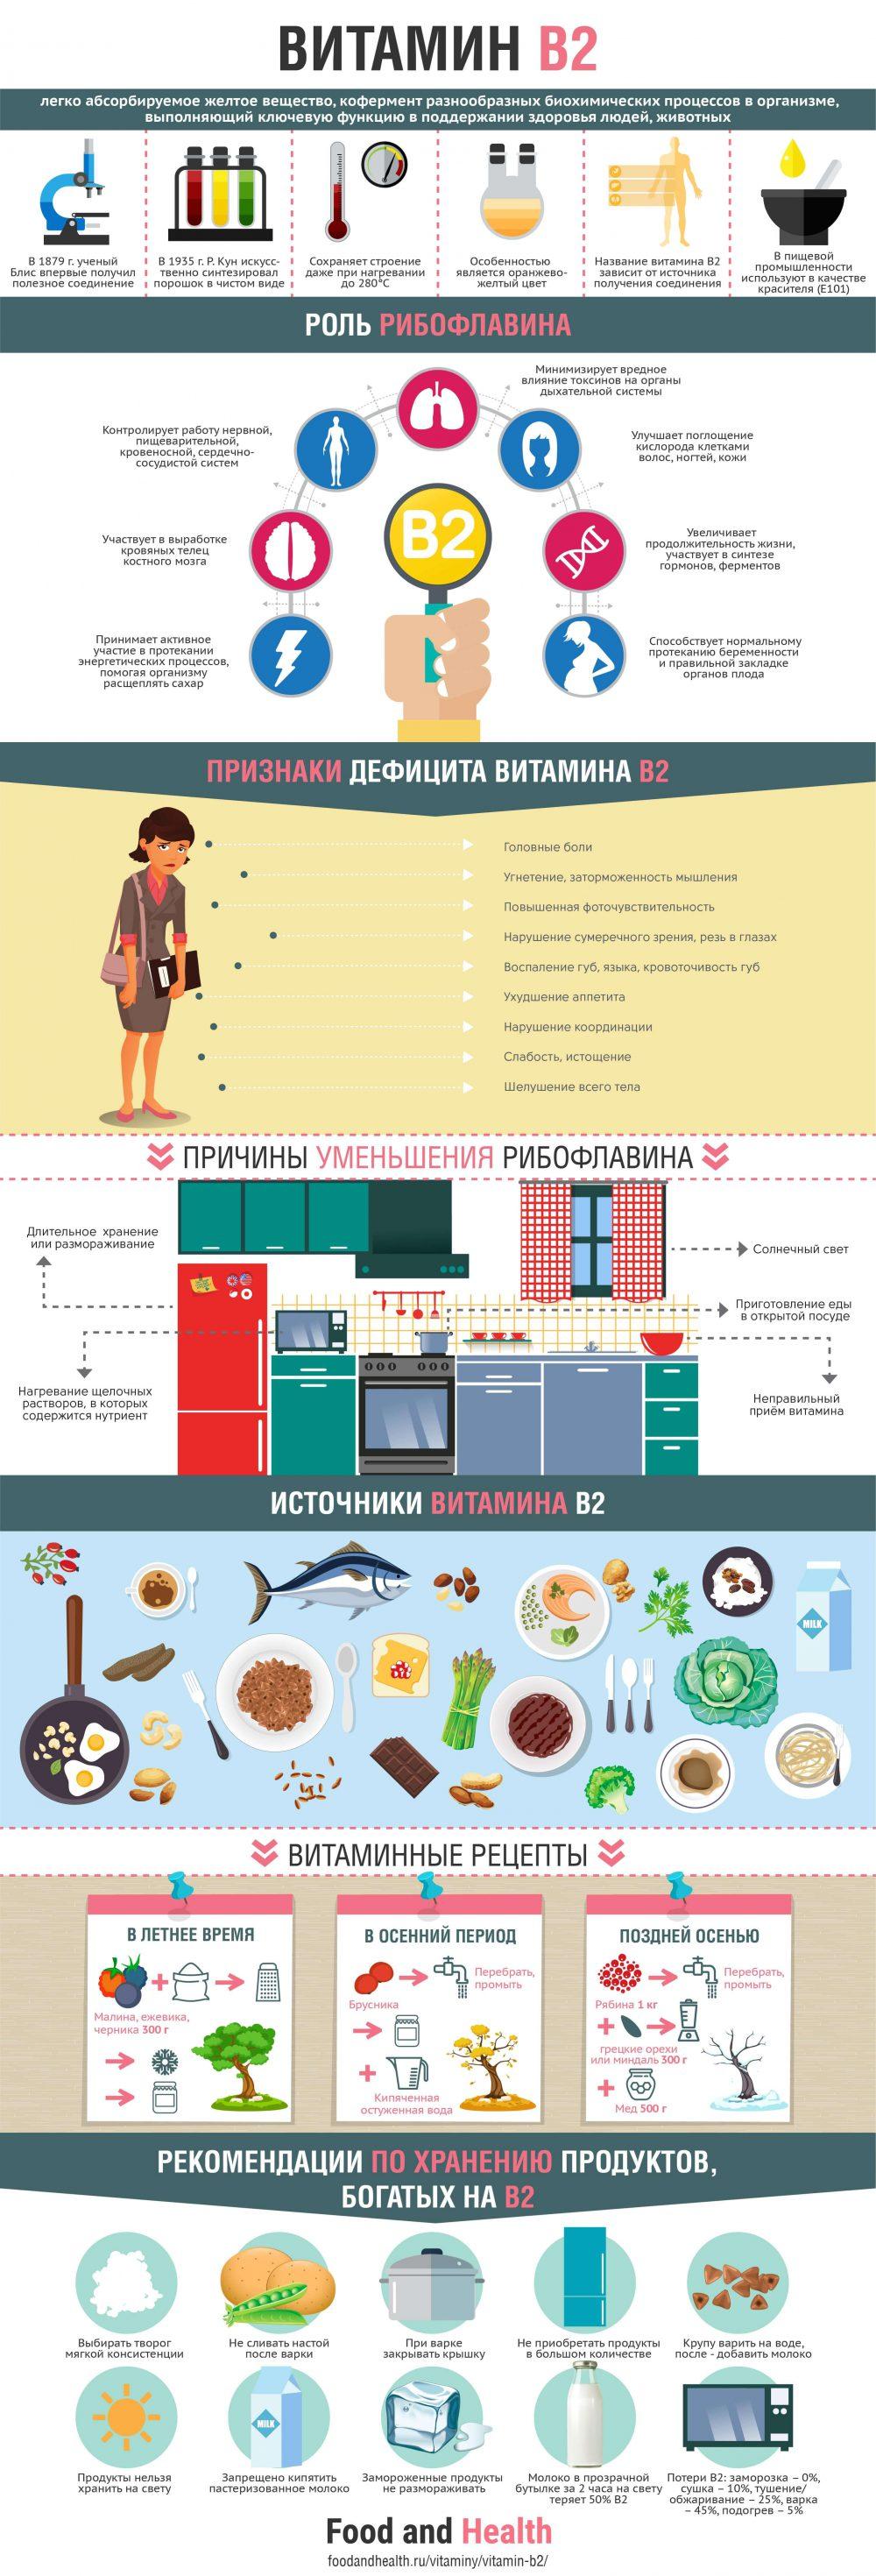 Витамин B2 - инфографика